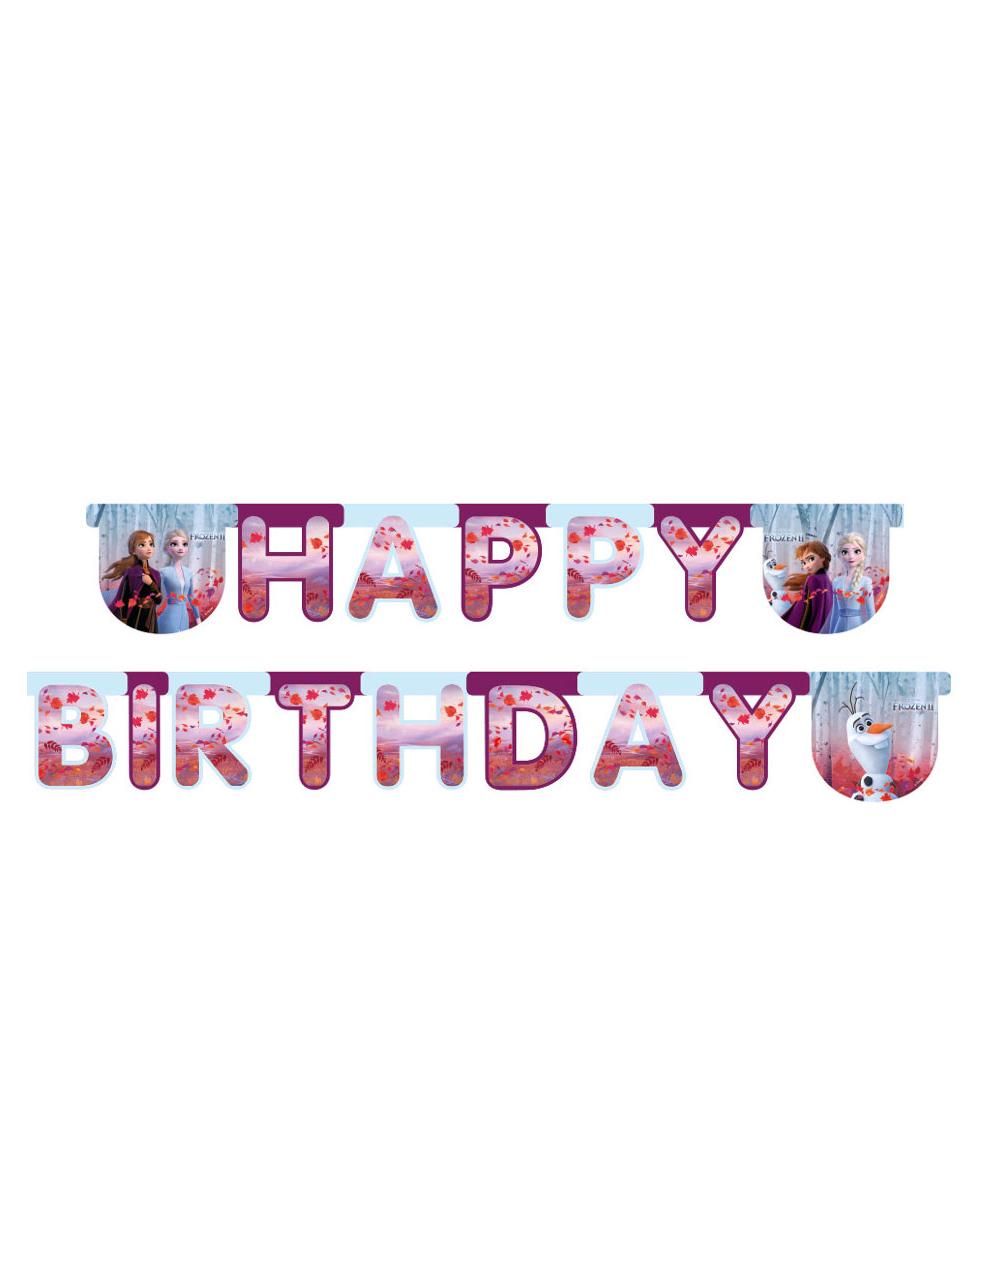 Disney Frozen 2 Happy Birthday Girlande Raumdeko Bunt 200 X 16cm Partydeko Und Gunstige Faschingskostume Vegaoo